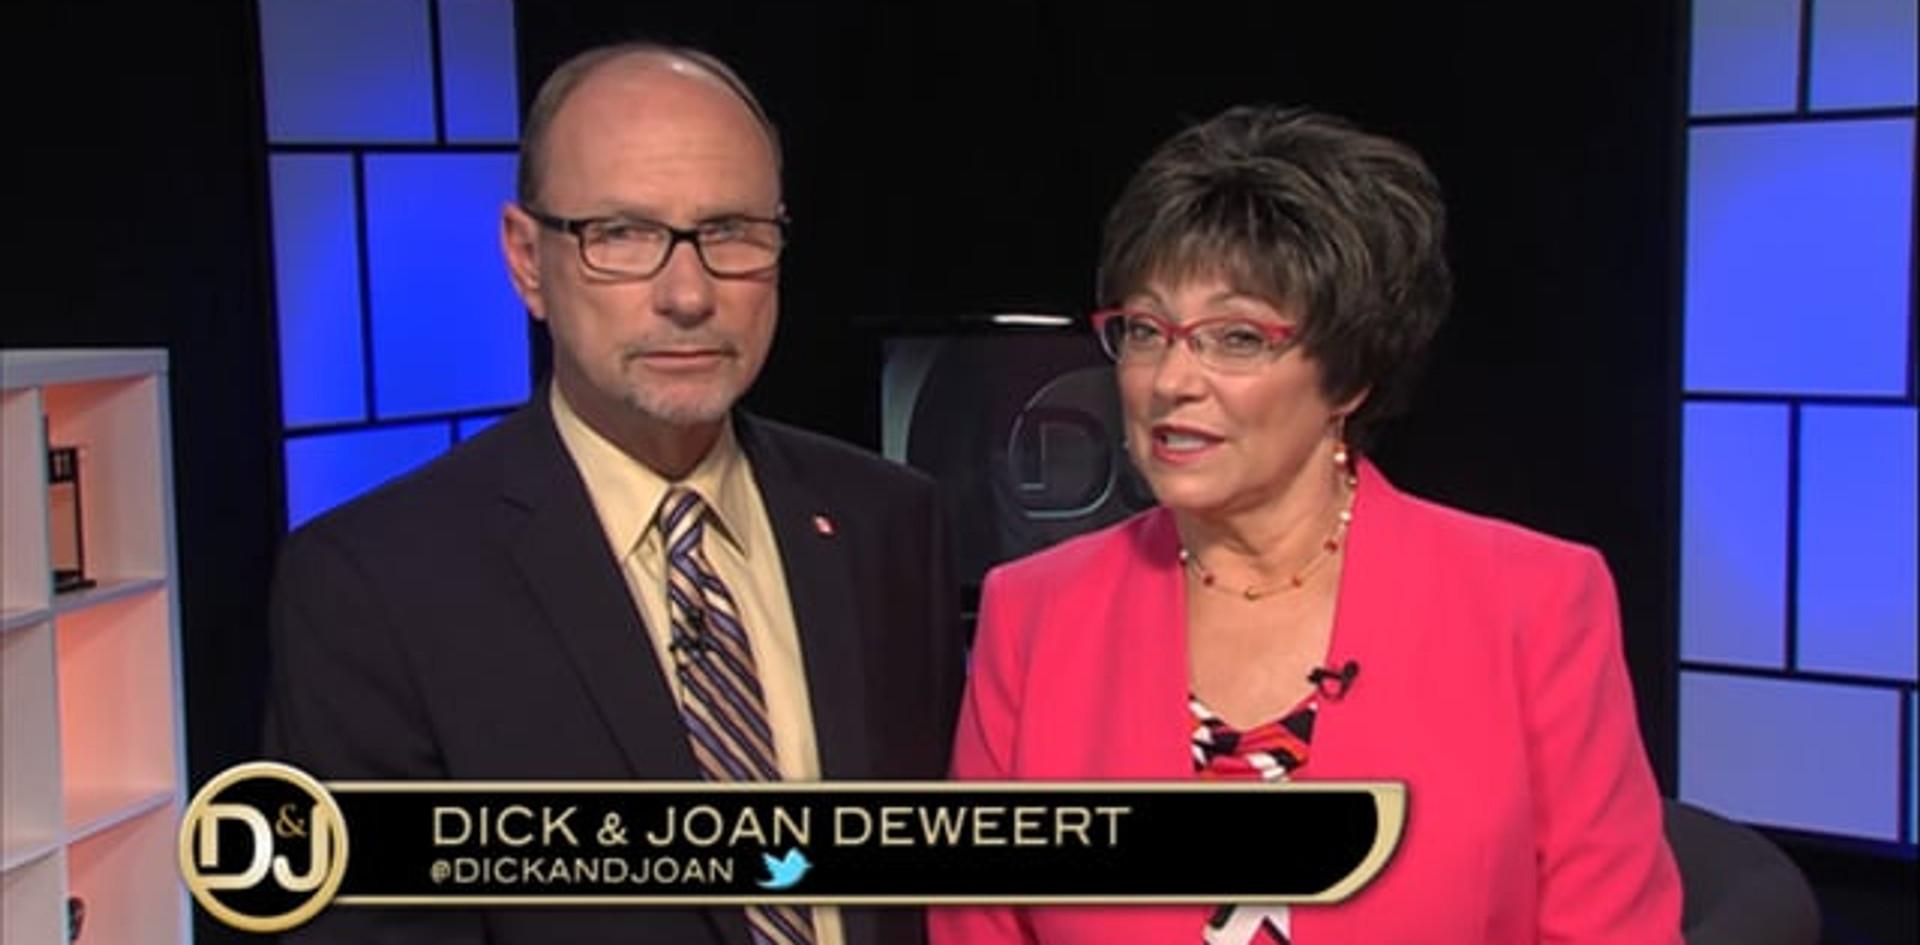 LIFELINE TODAY | Season 3, Episode 58 | Joan Deweert